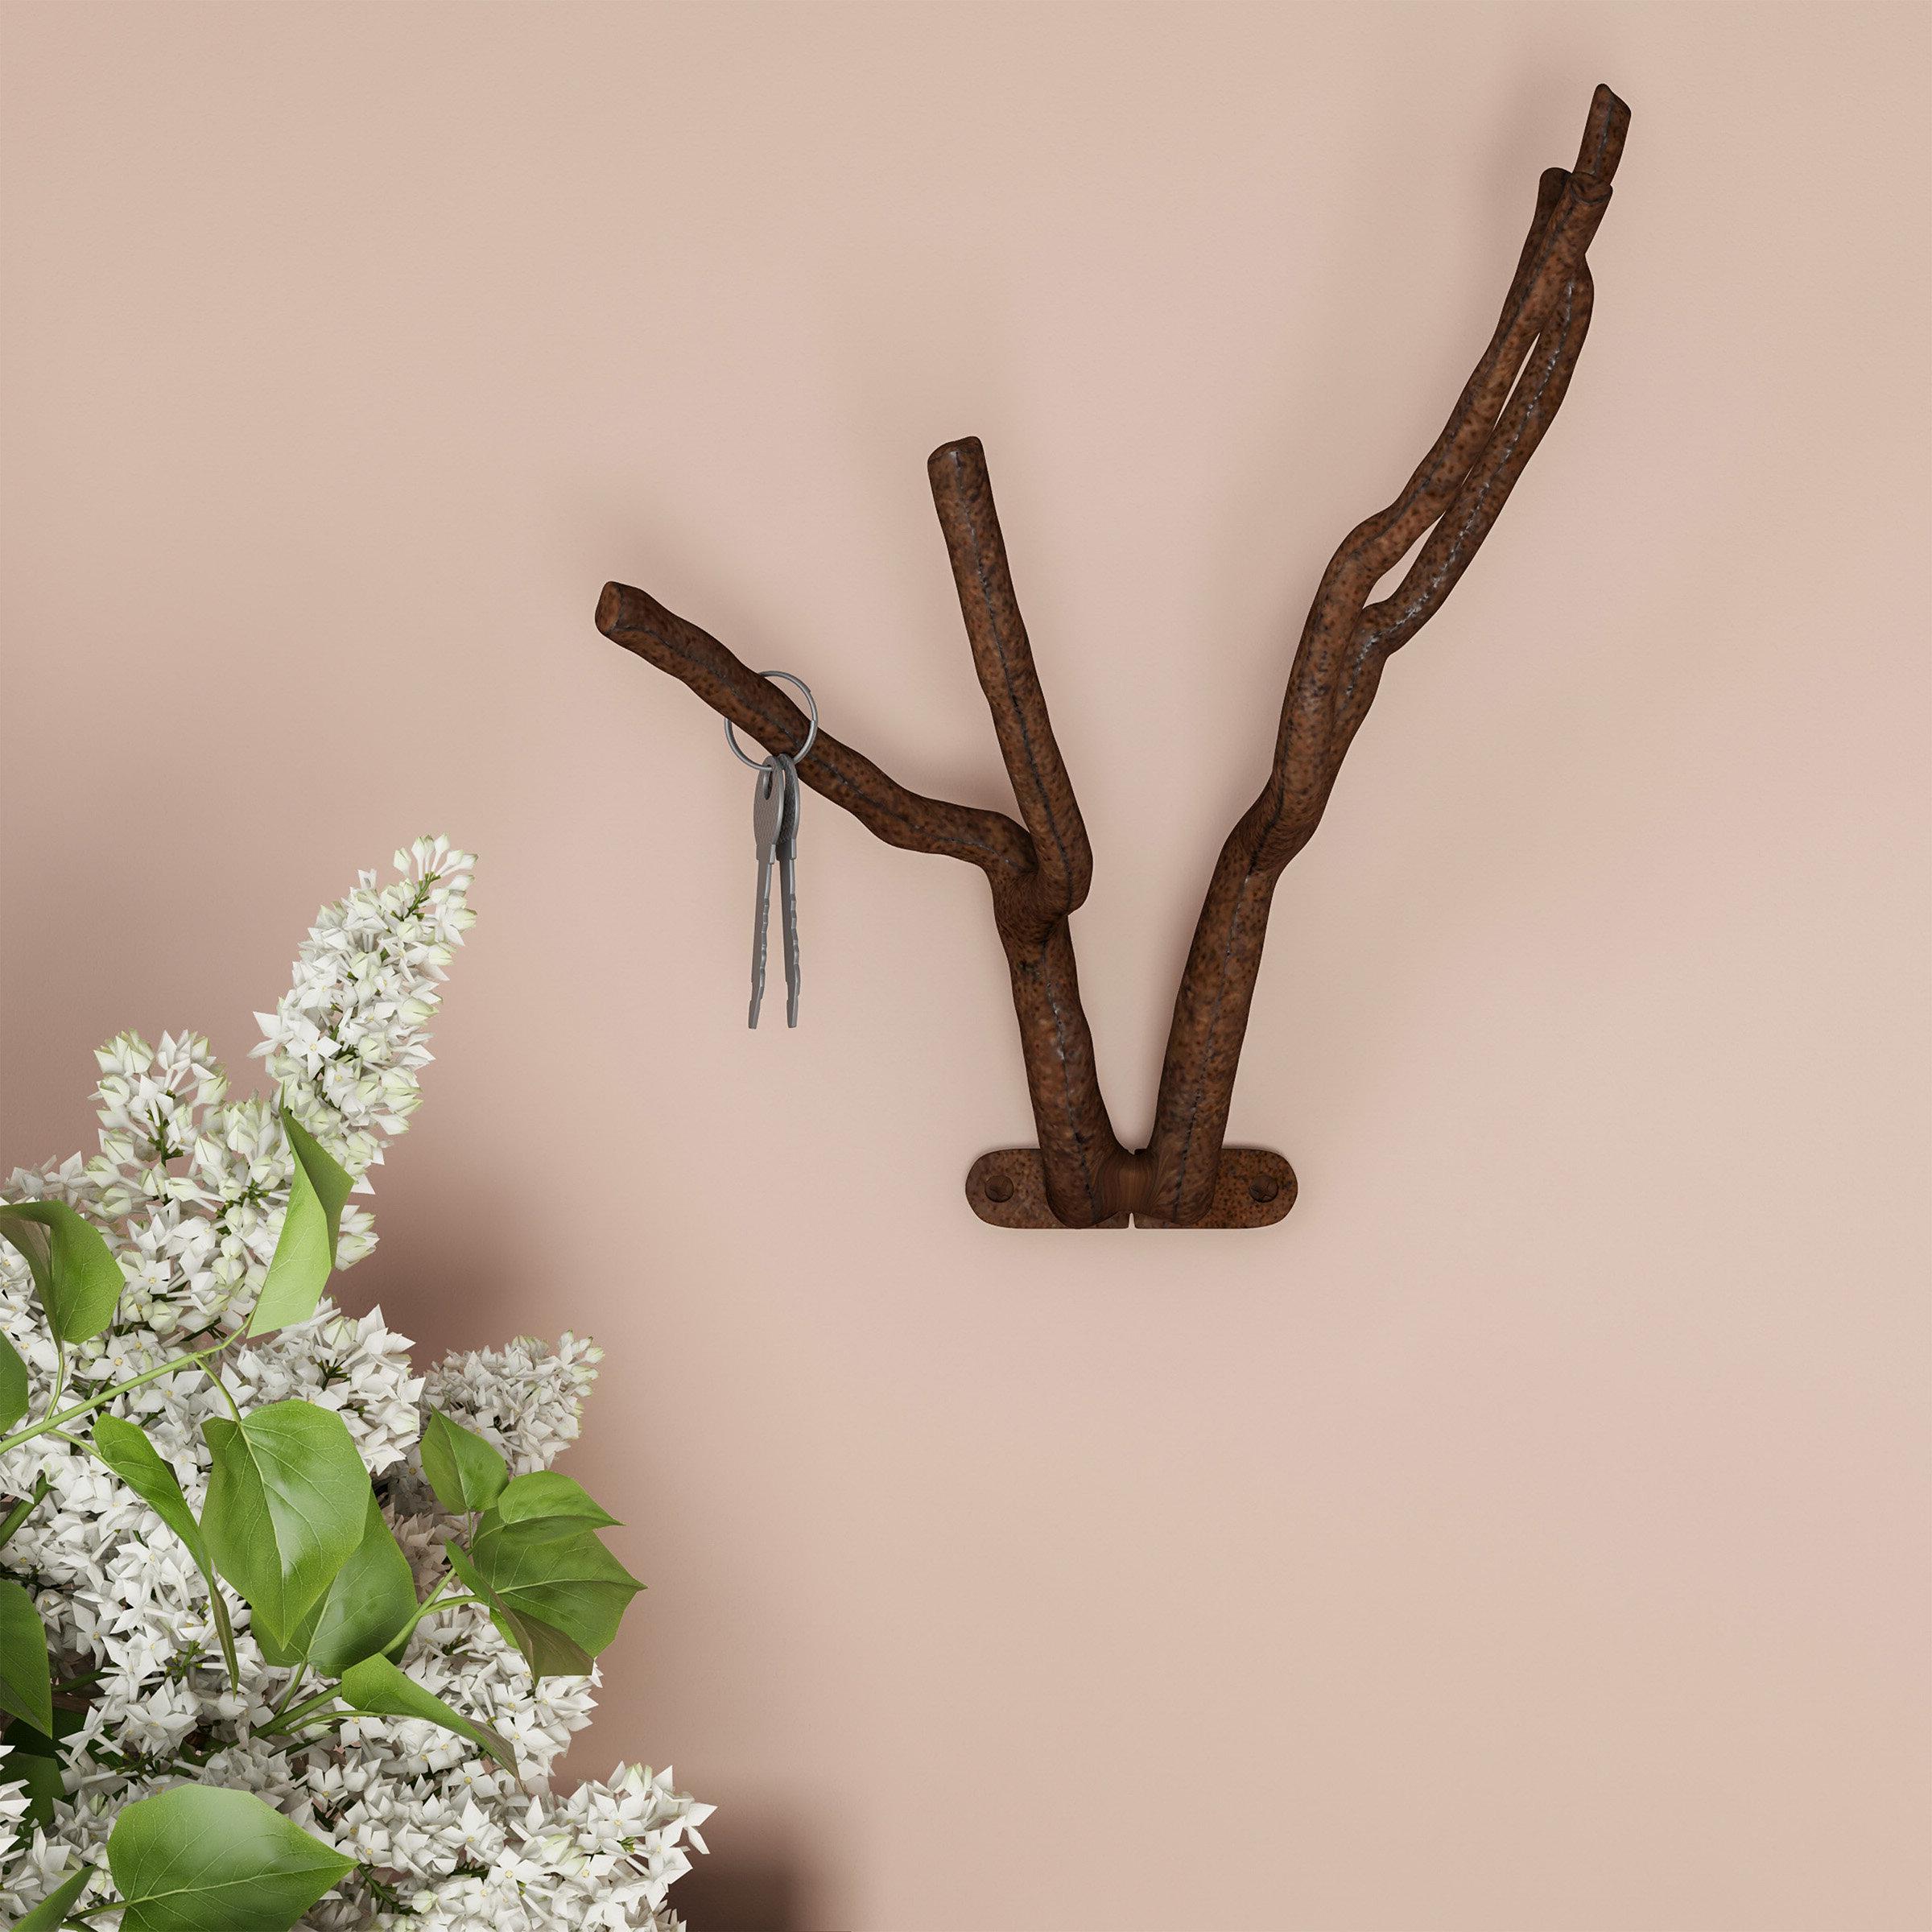 Well Liked Fleur De Lis Living Coat Racks & Umbrella Stands You'll Love In Tree Branch Wall Décor By Fleur De Lis Living (View 4 of 20)